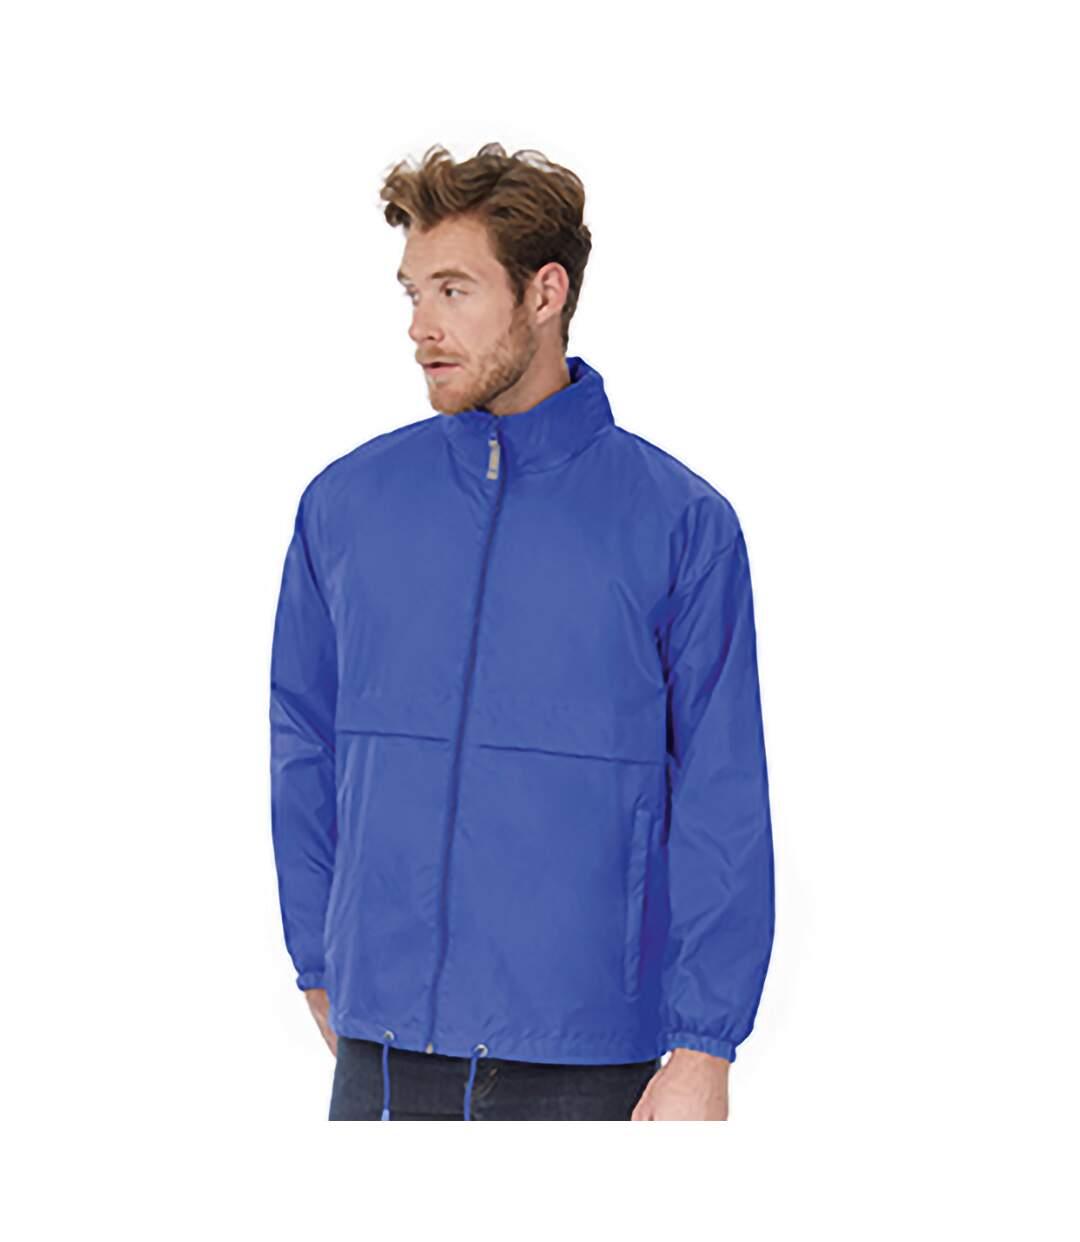 B&C Mens Air Lightweight Windproof, Showerproof & Water Repellent Jacket (Royal Blue) - UTBC1281